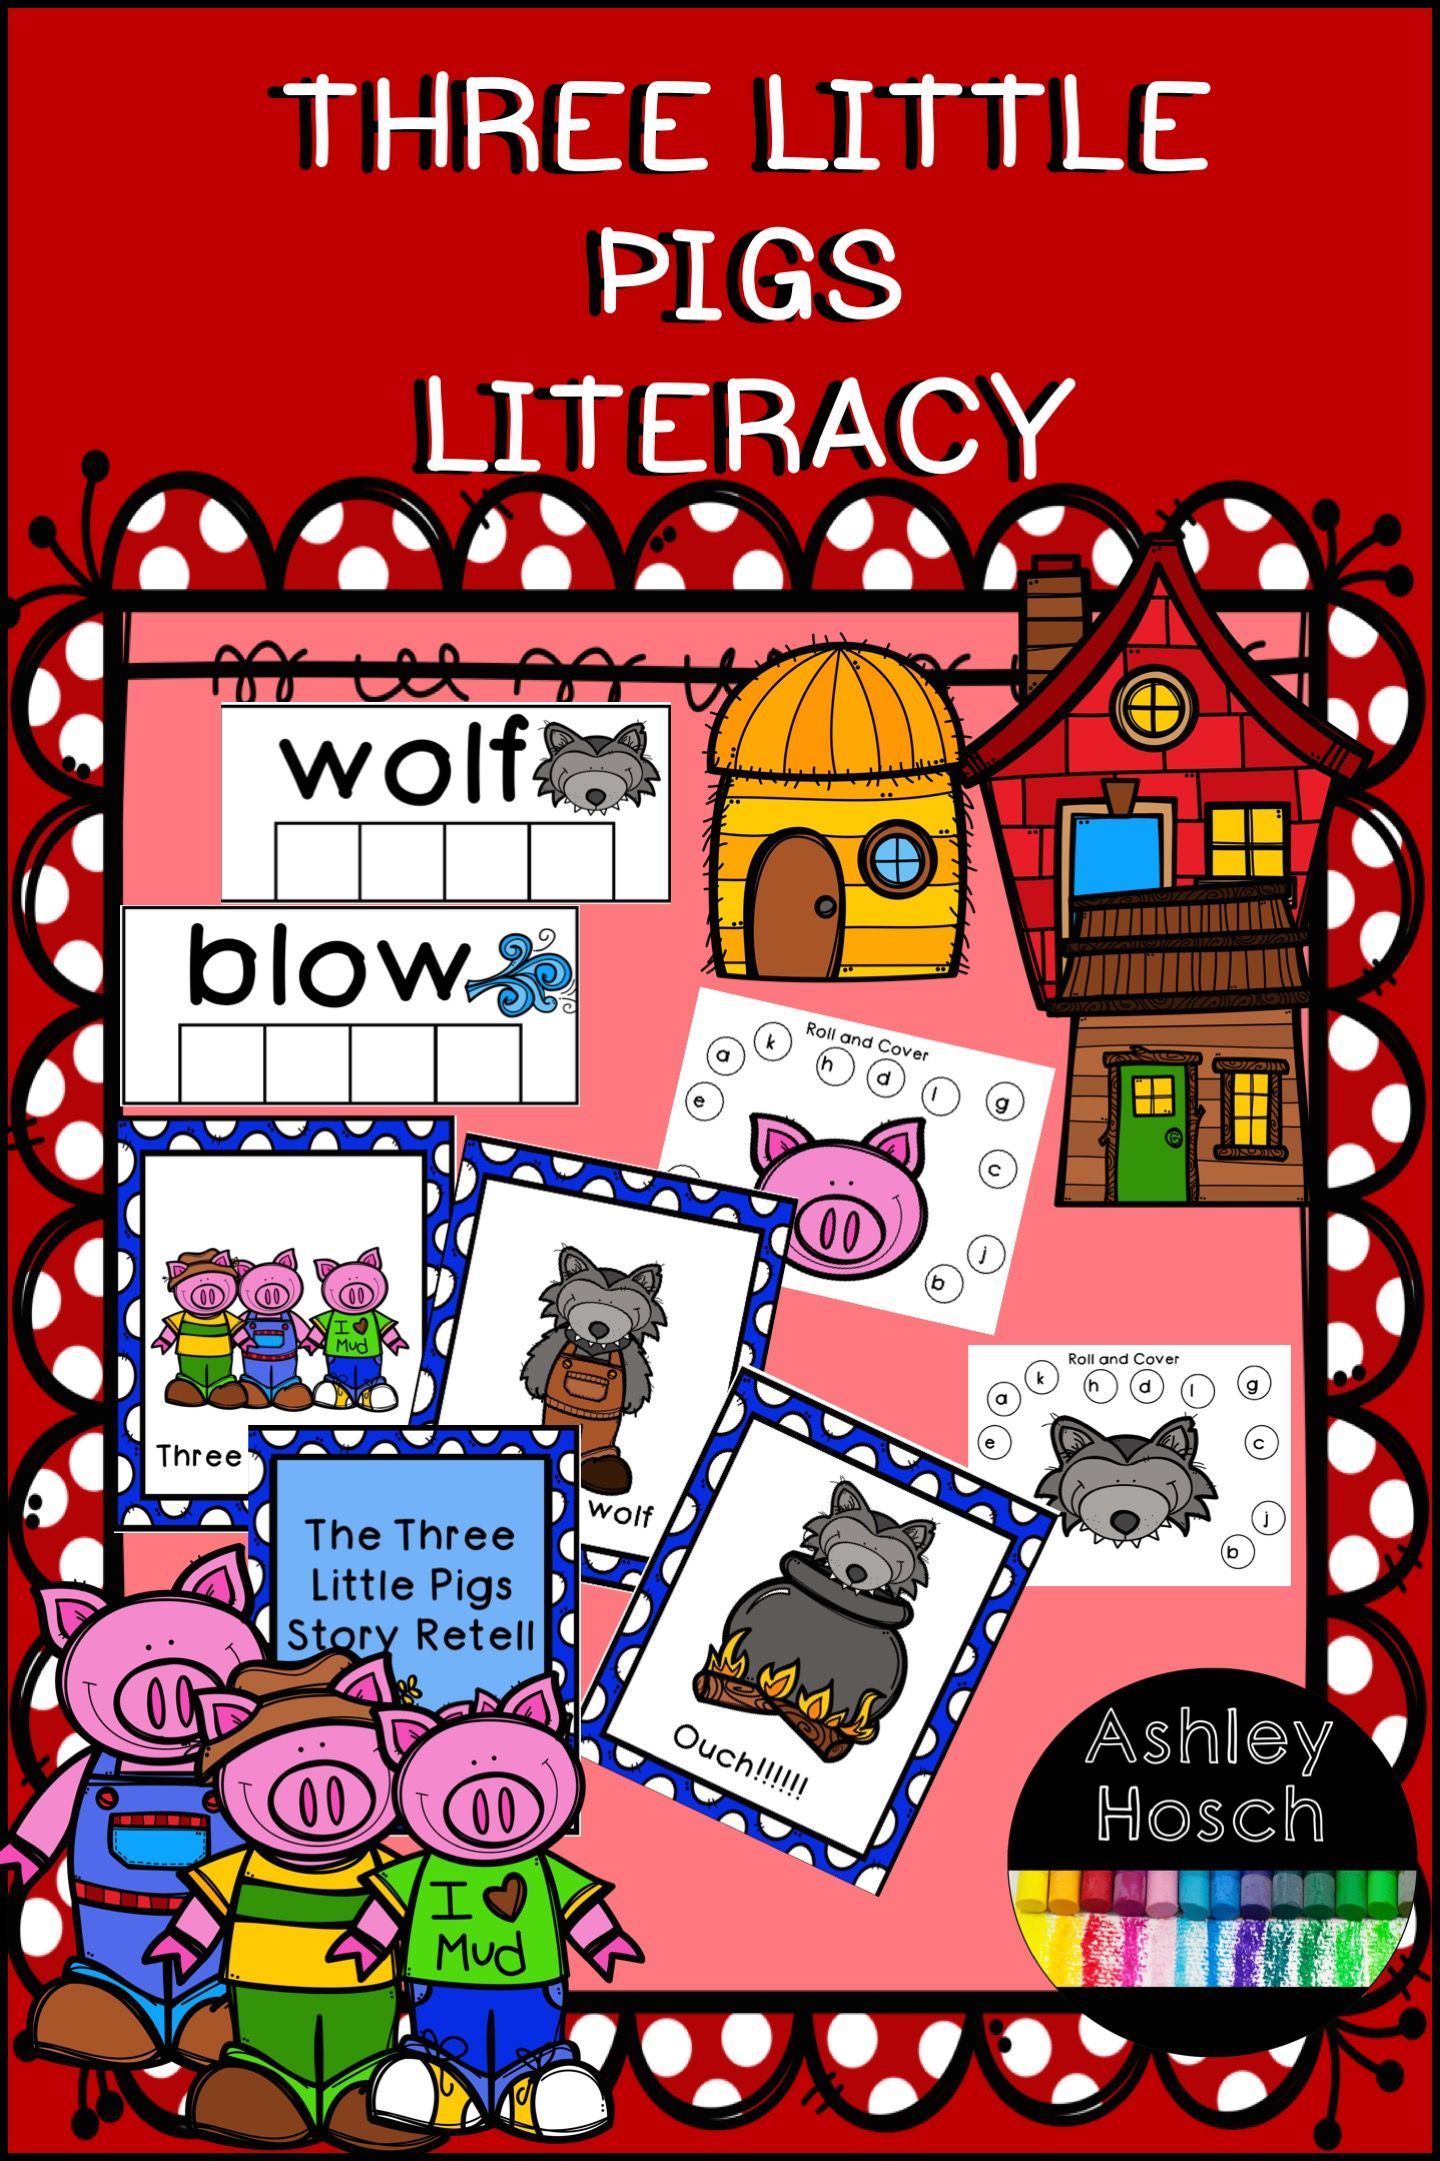 Three Little Pigs Literacy For Preschool Kindergarten Three Little Pigs Circle Time Activities Little Pigs [ 2161 x 1440 Pixel ]